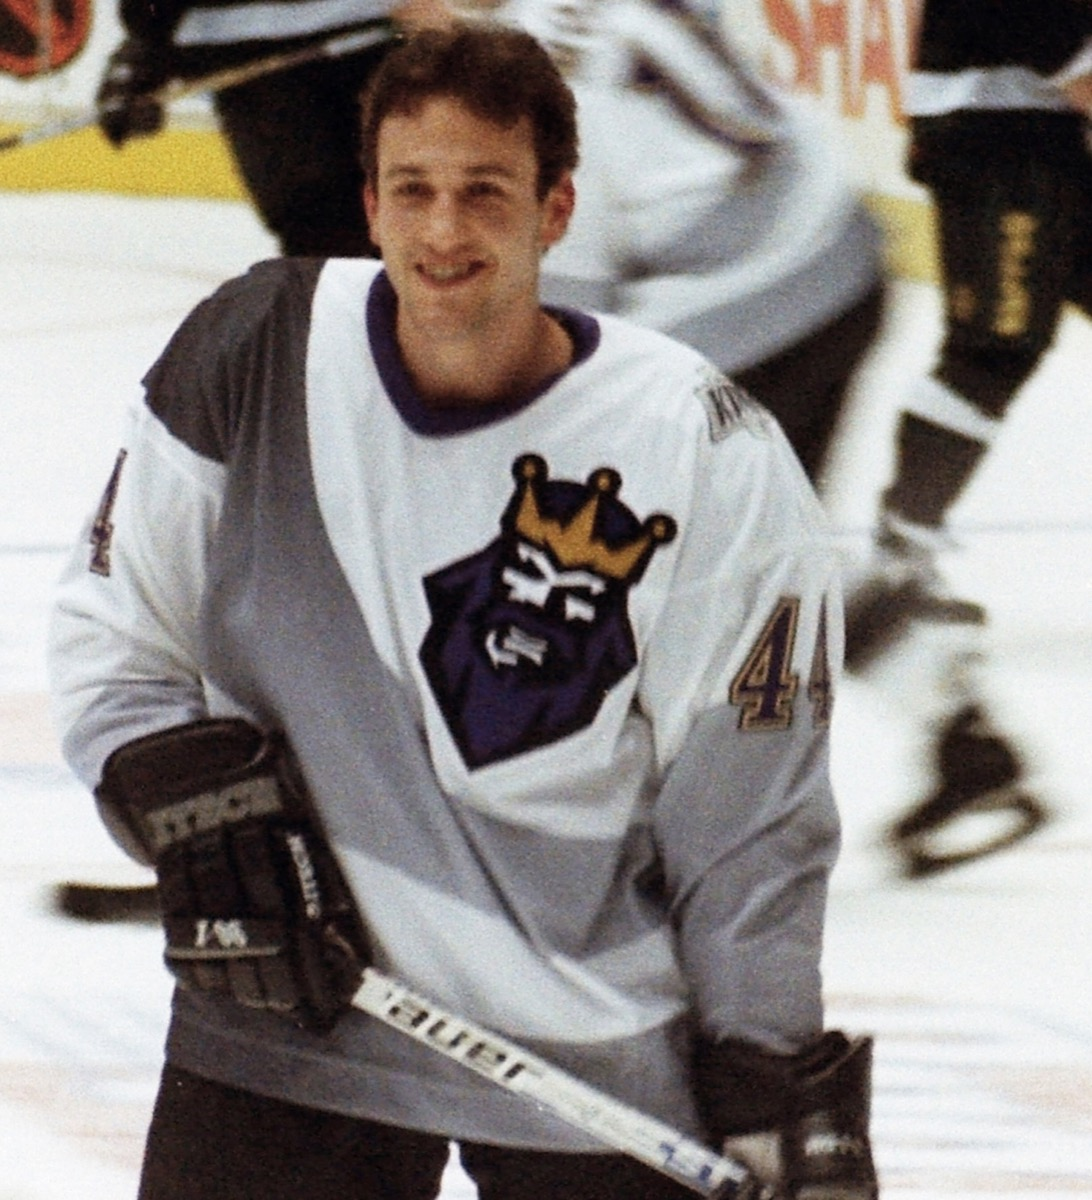 los angeles kings uniform 1996